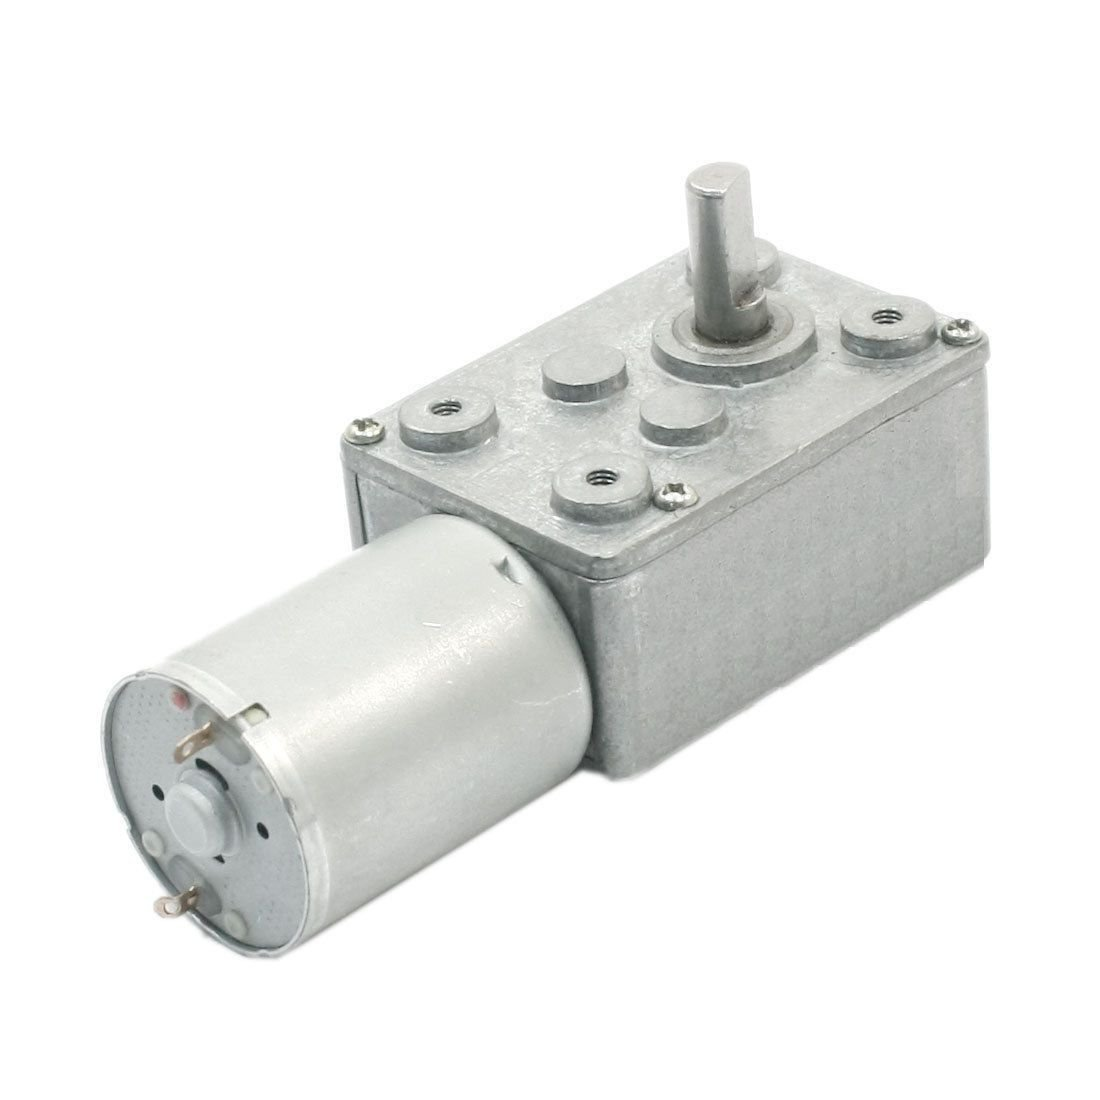 DC 12V 6mm Shaft High Torque Turbine Worm Gear Box Reduction Motor